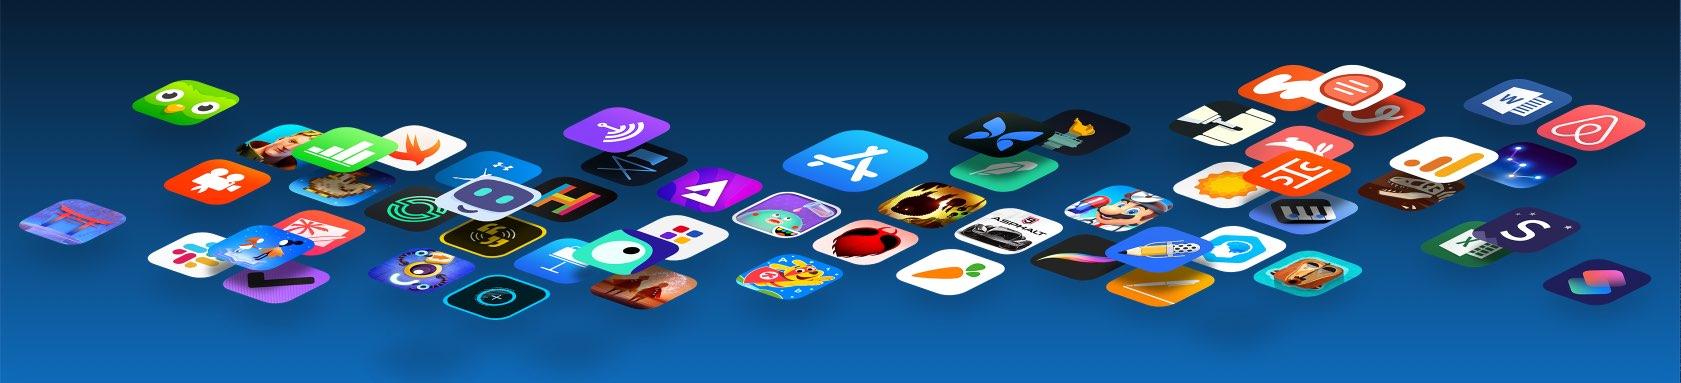 Taser image representing floating App Store app icons